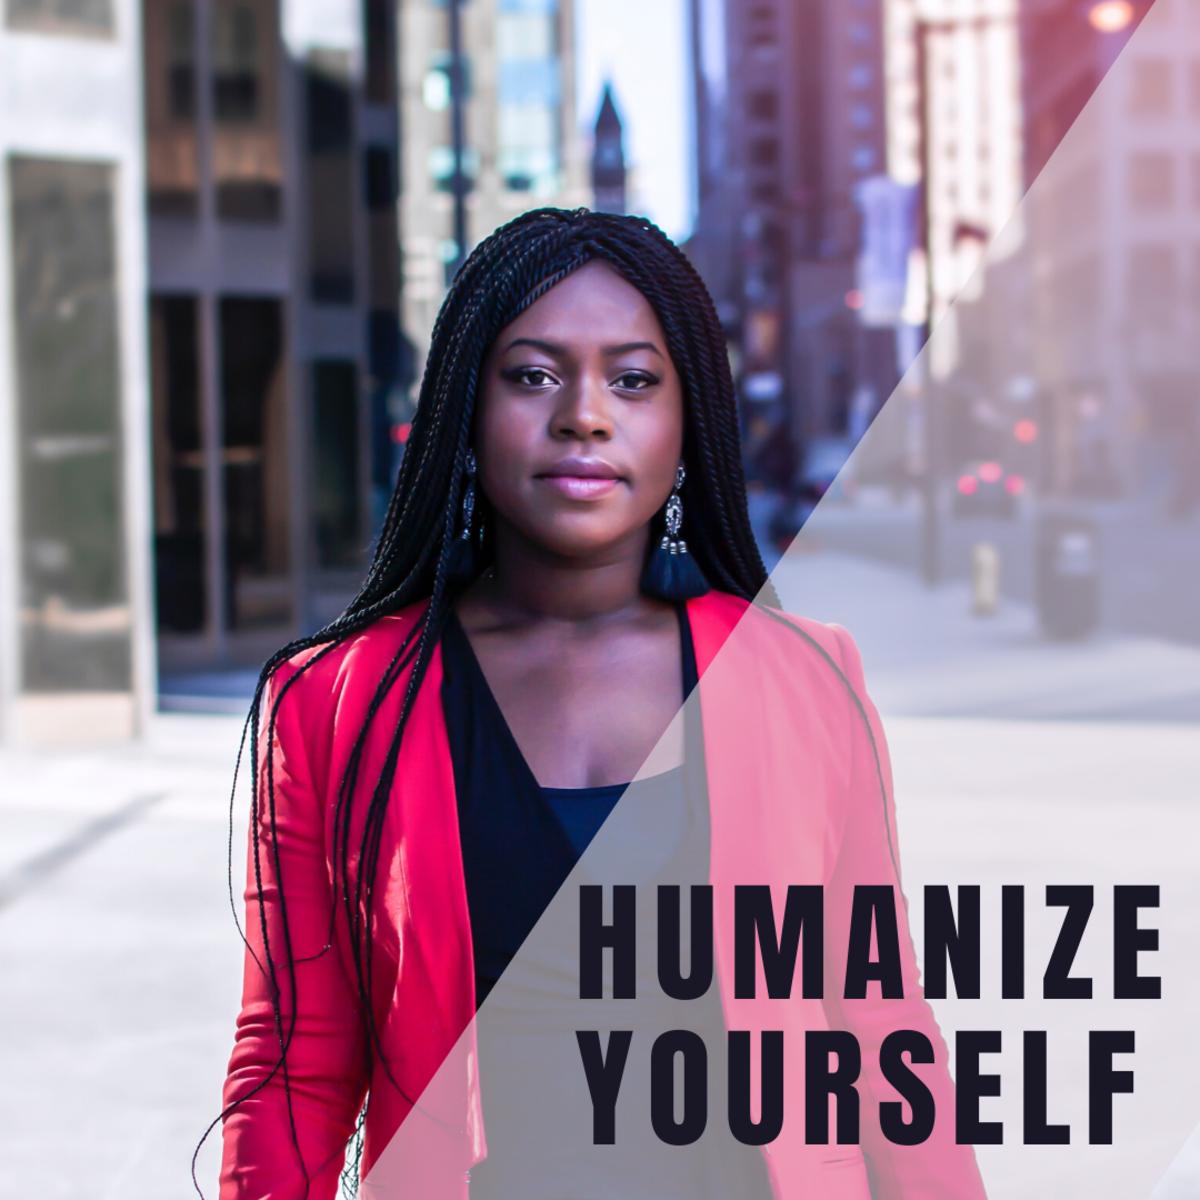 Humanize Yourself